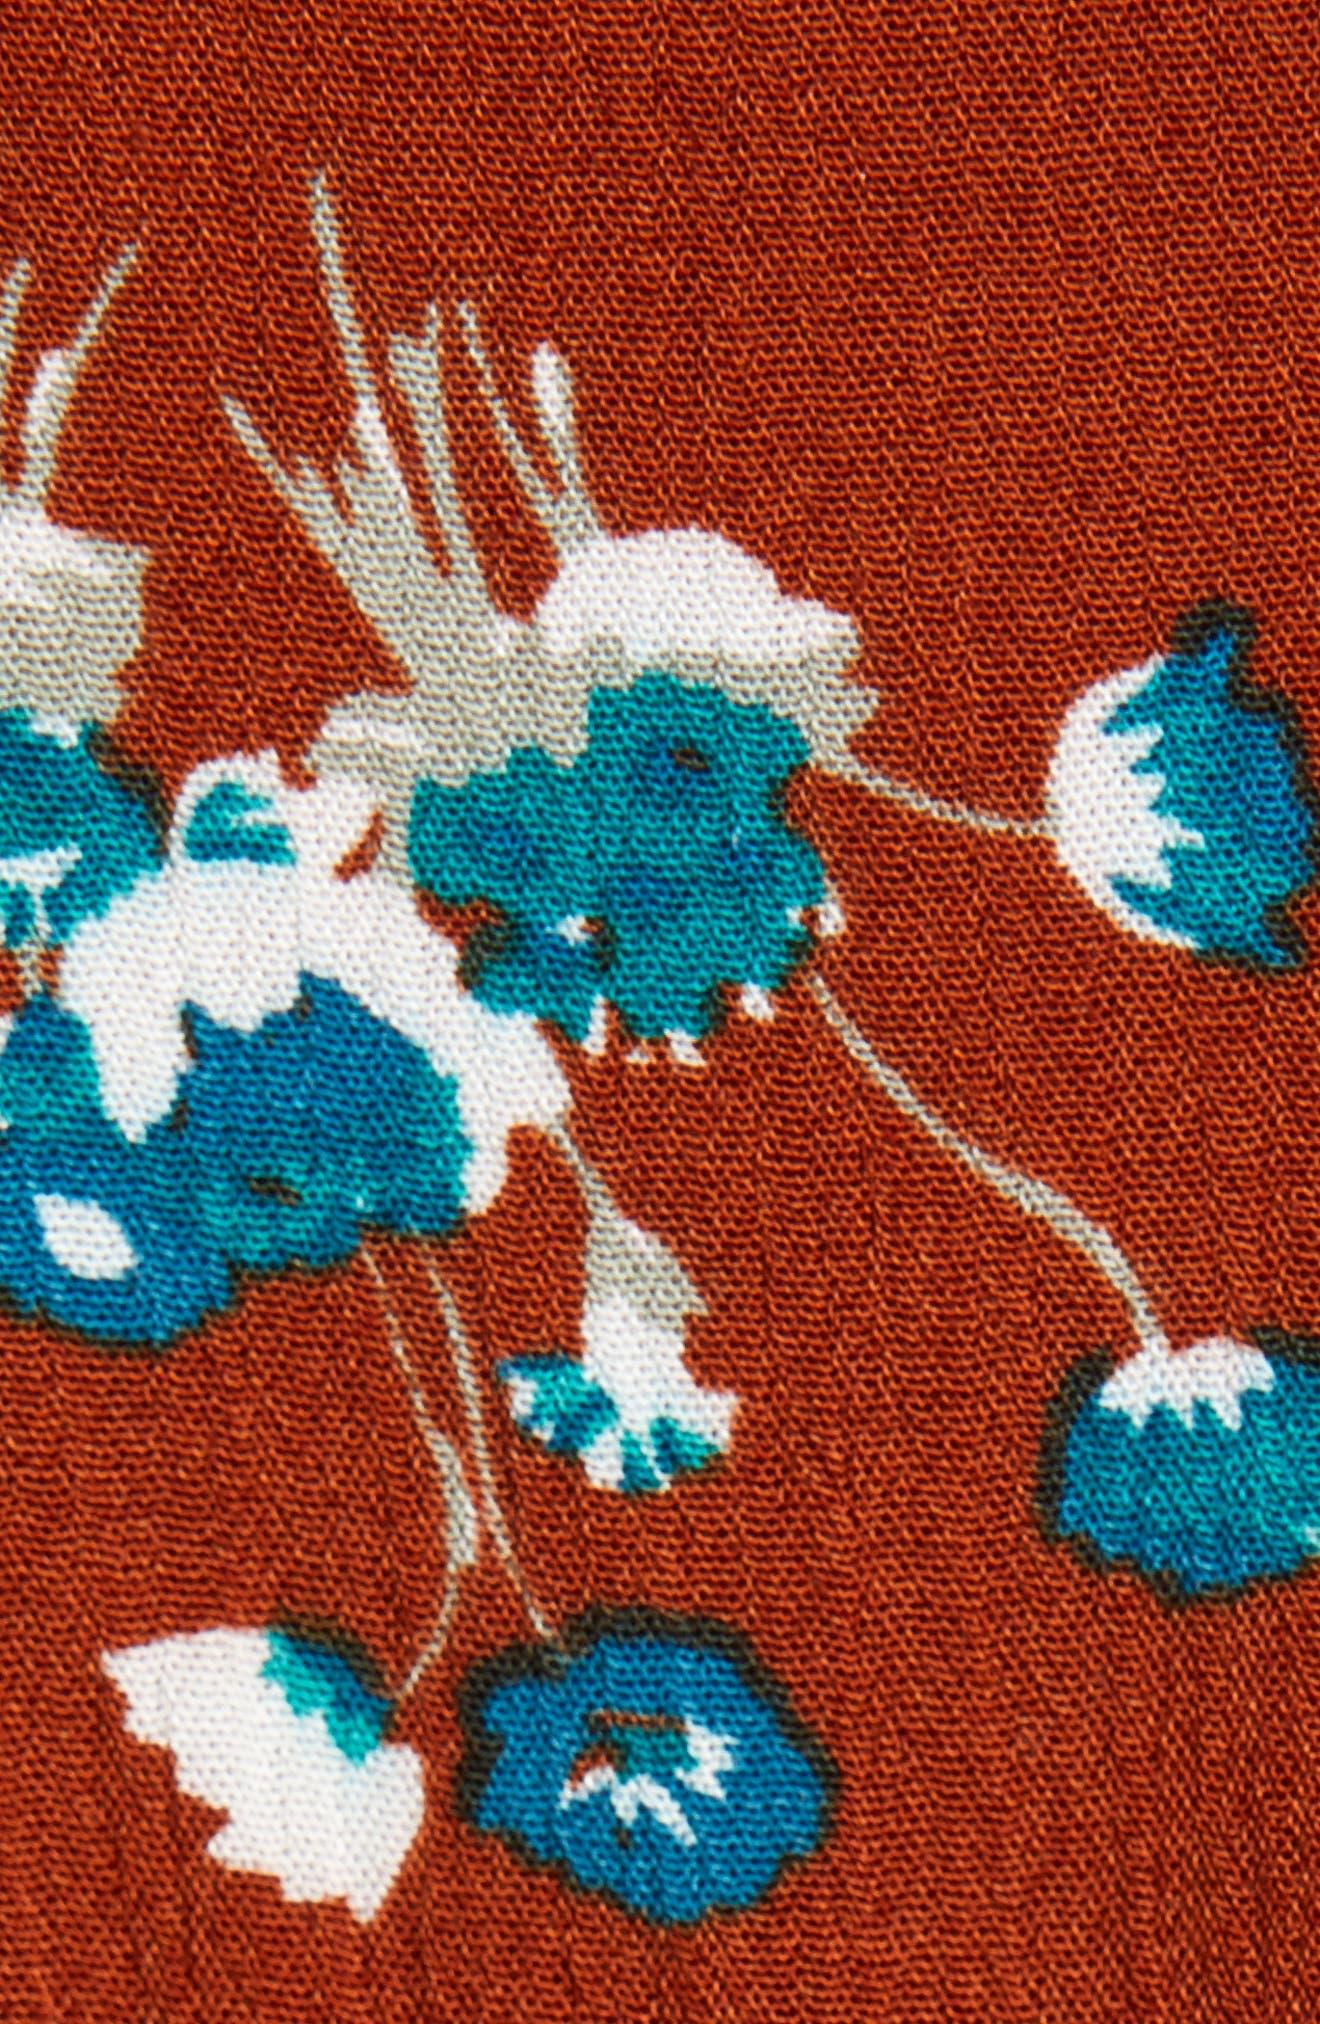 Blouson Midi Dress,                             Alternate thumbnail 6, color,                             BROWN SPICE FLORAL